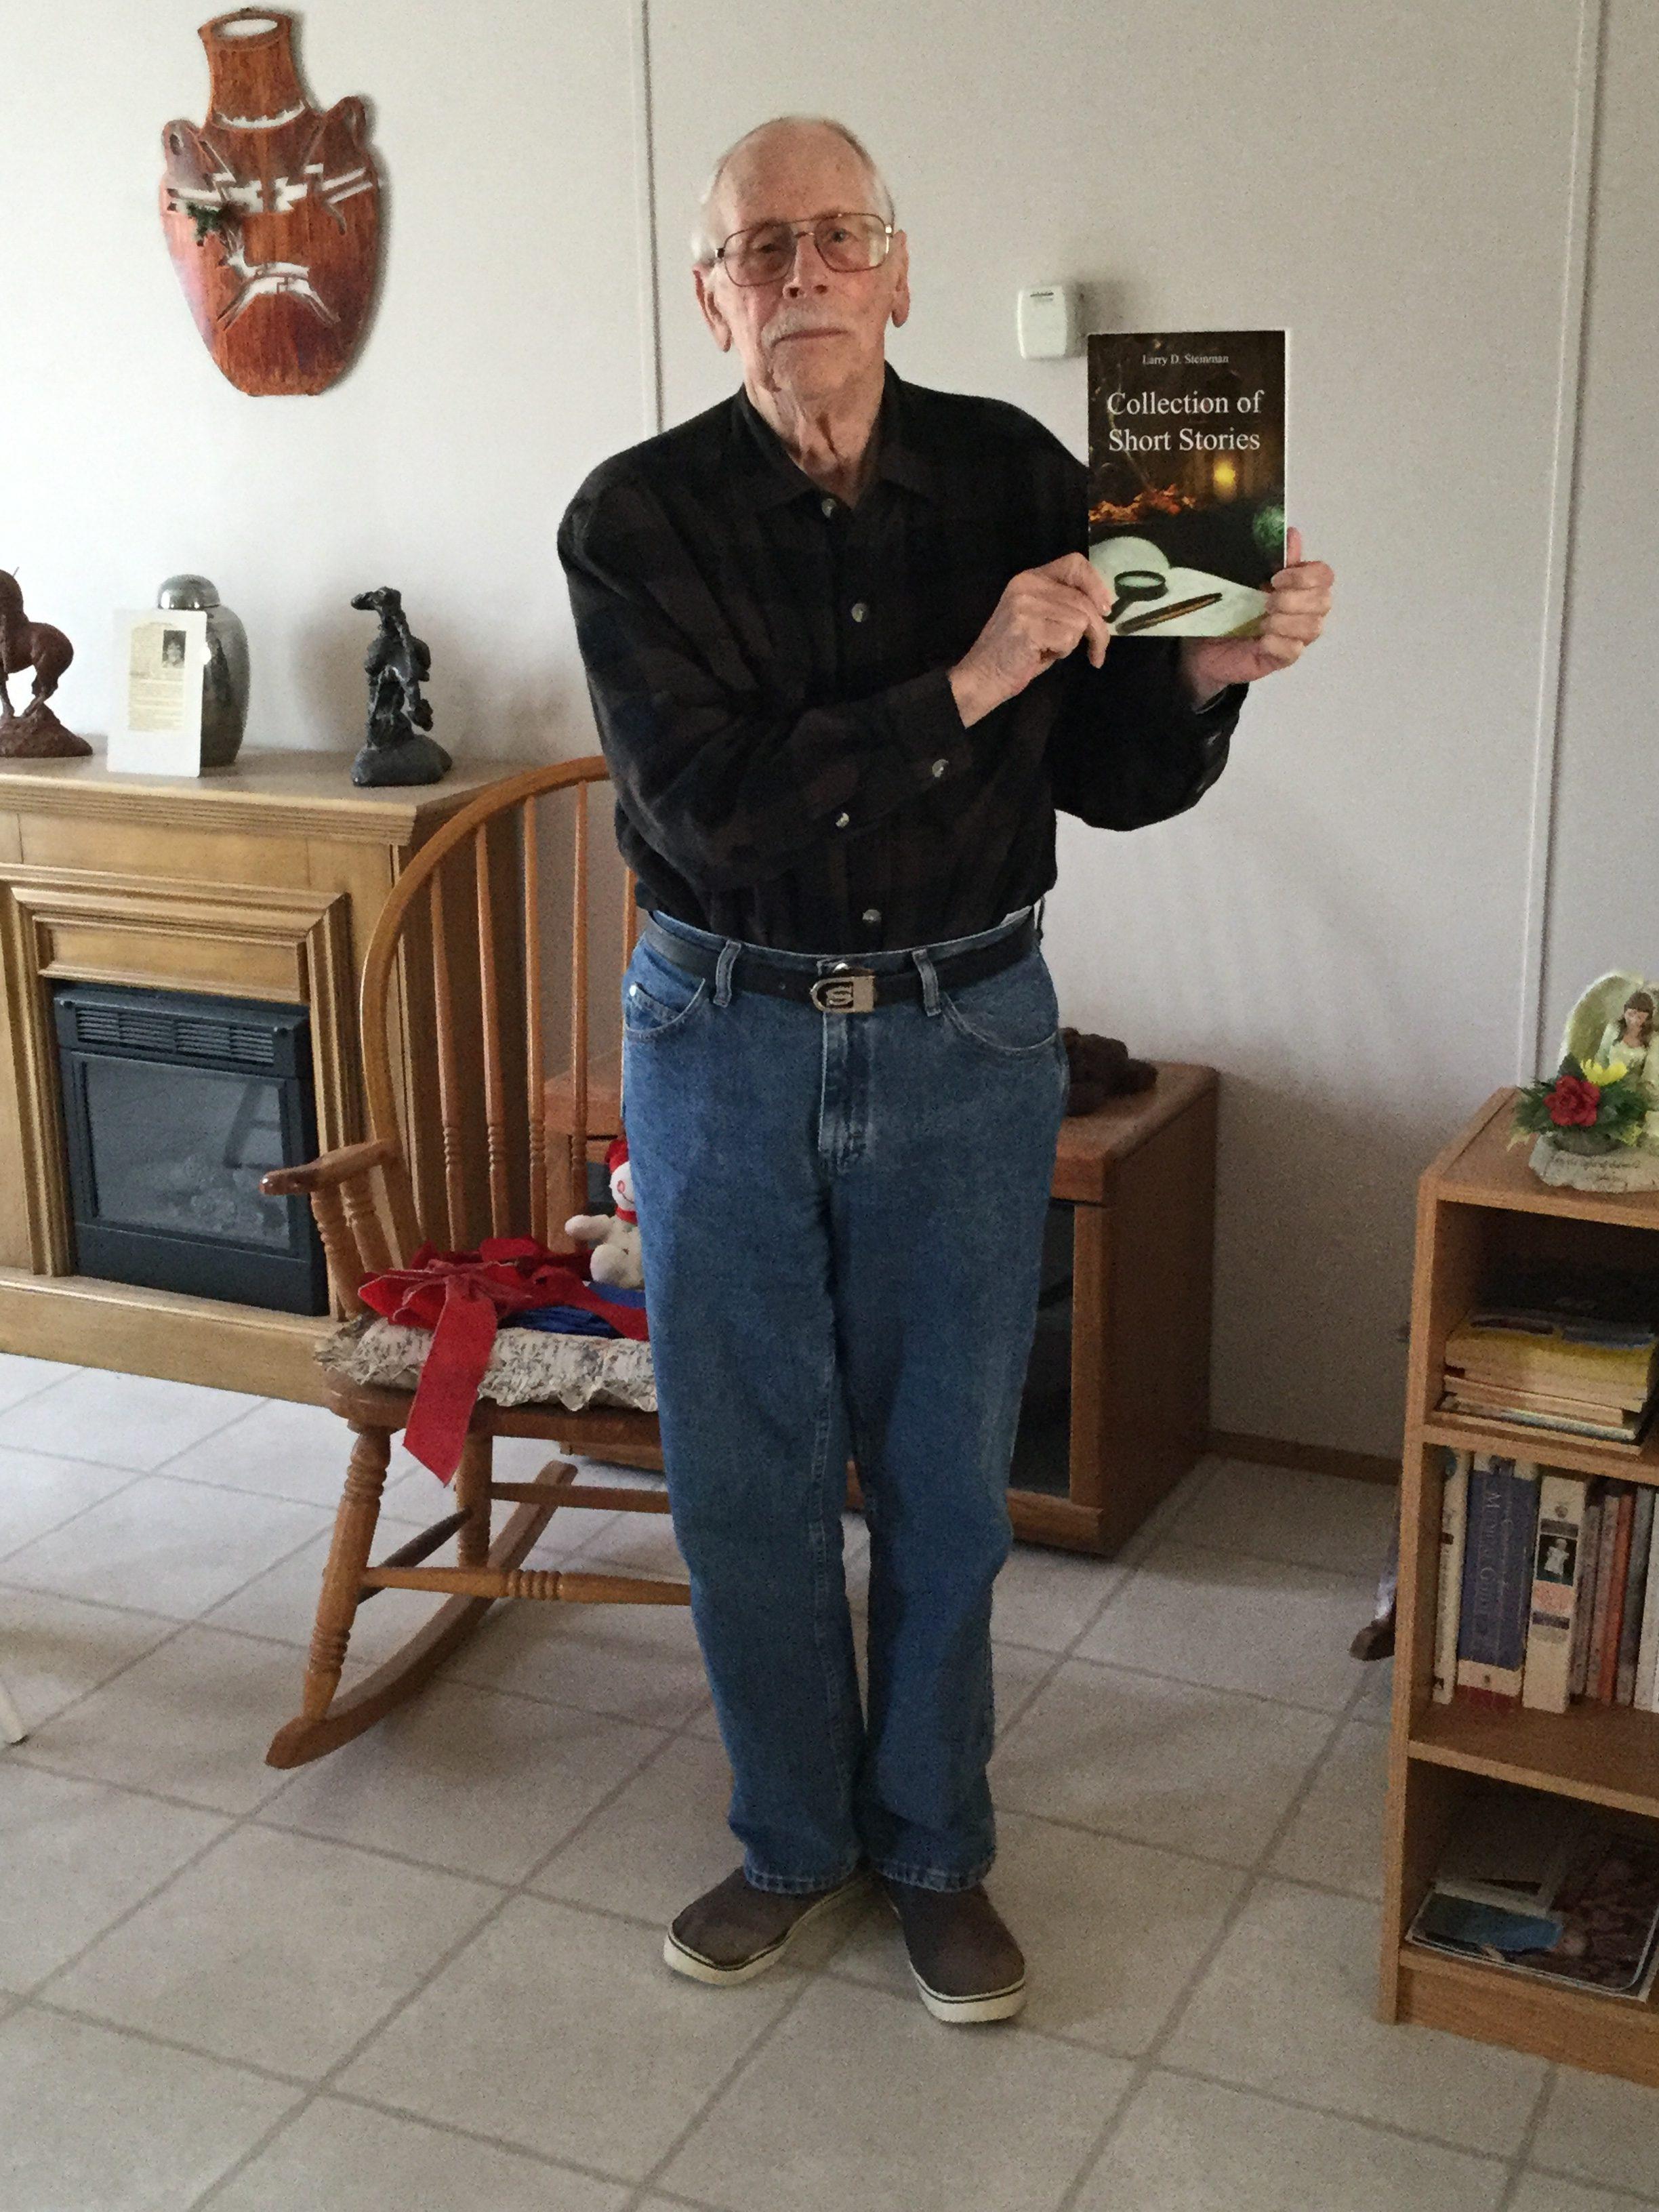 Larry Steinman